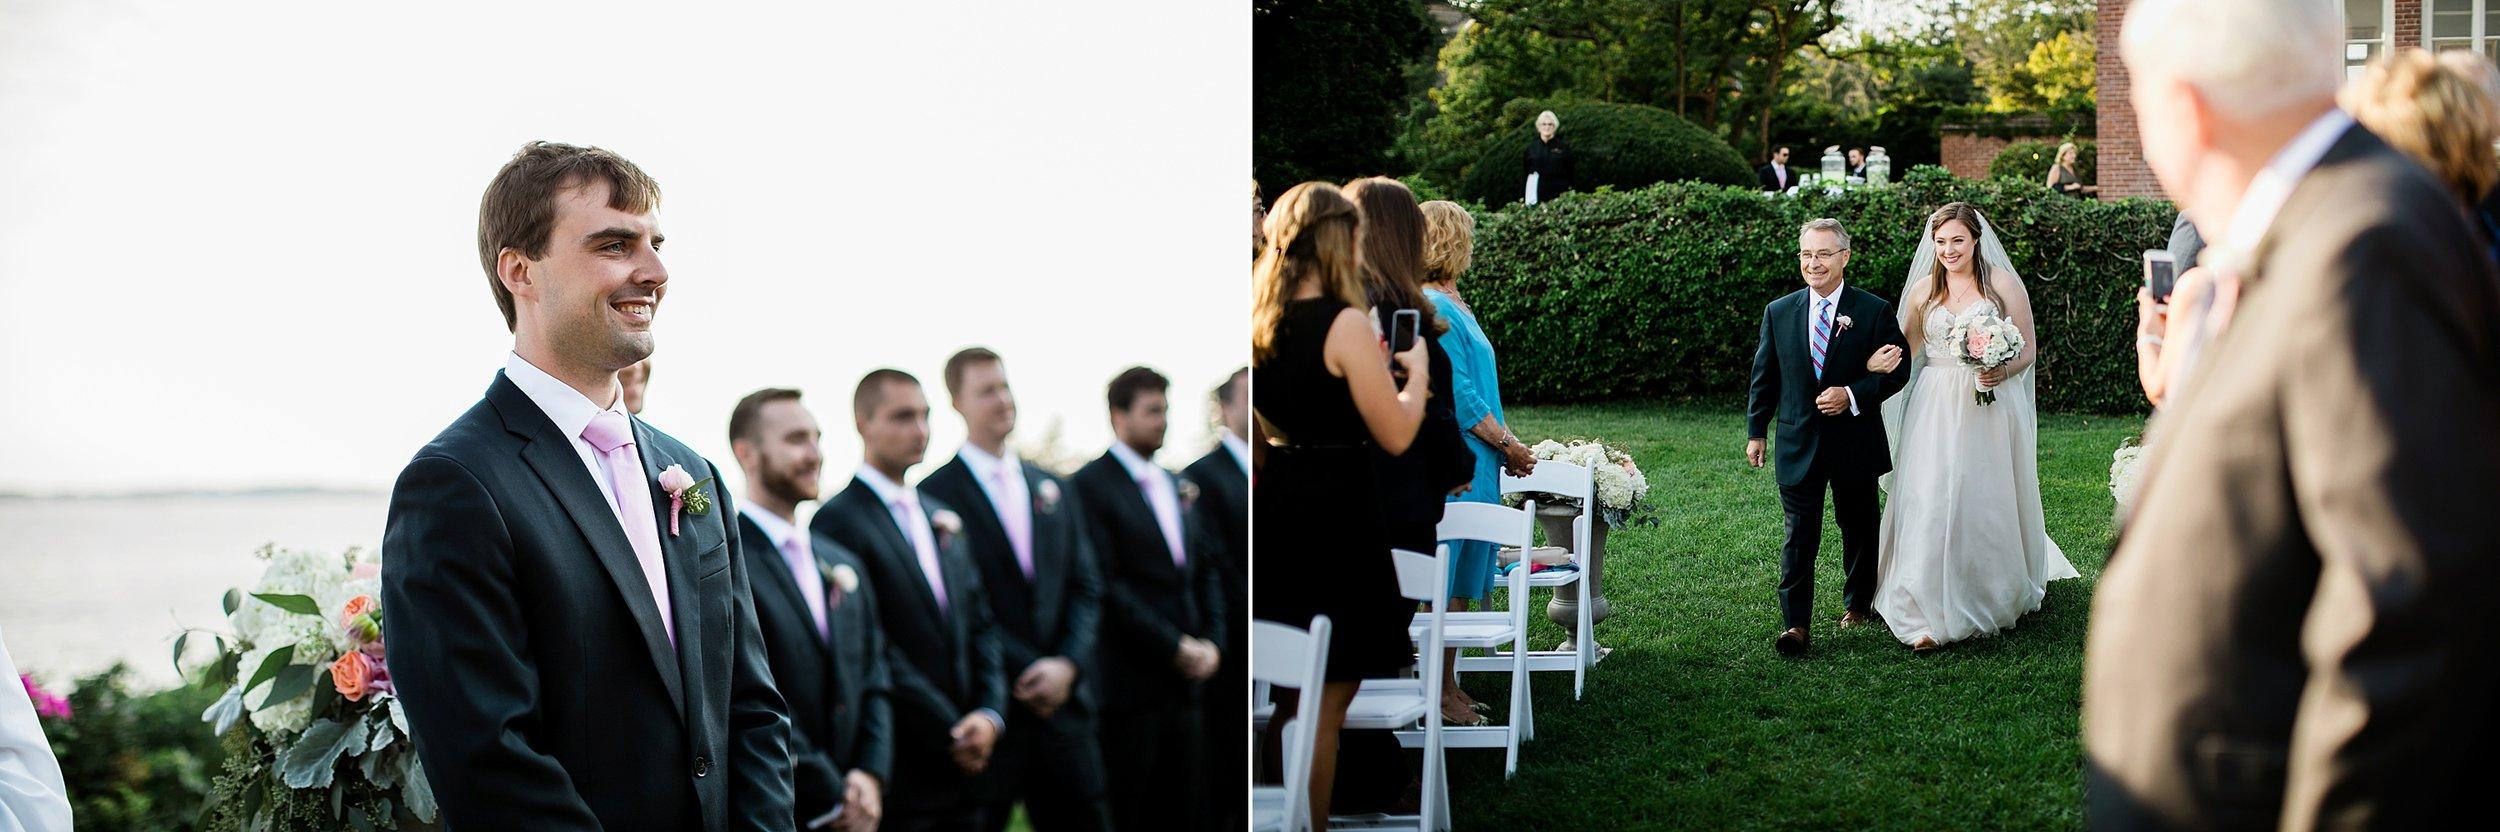 026 los angeles wedding photographer todd danforth photography boston.jpg